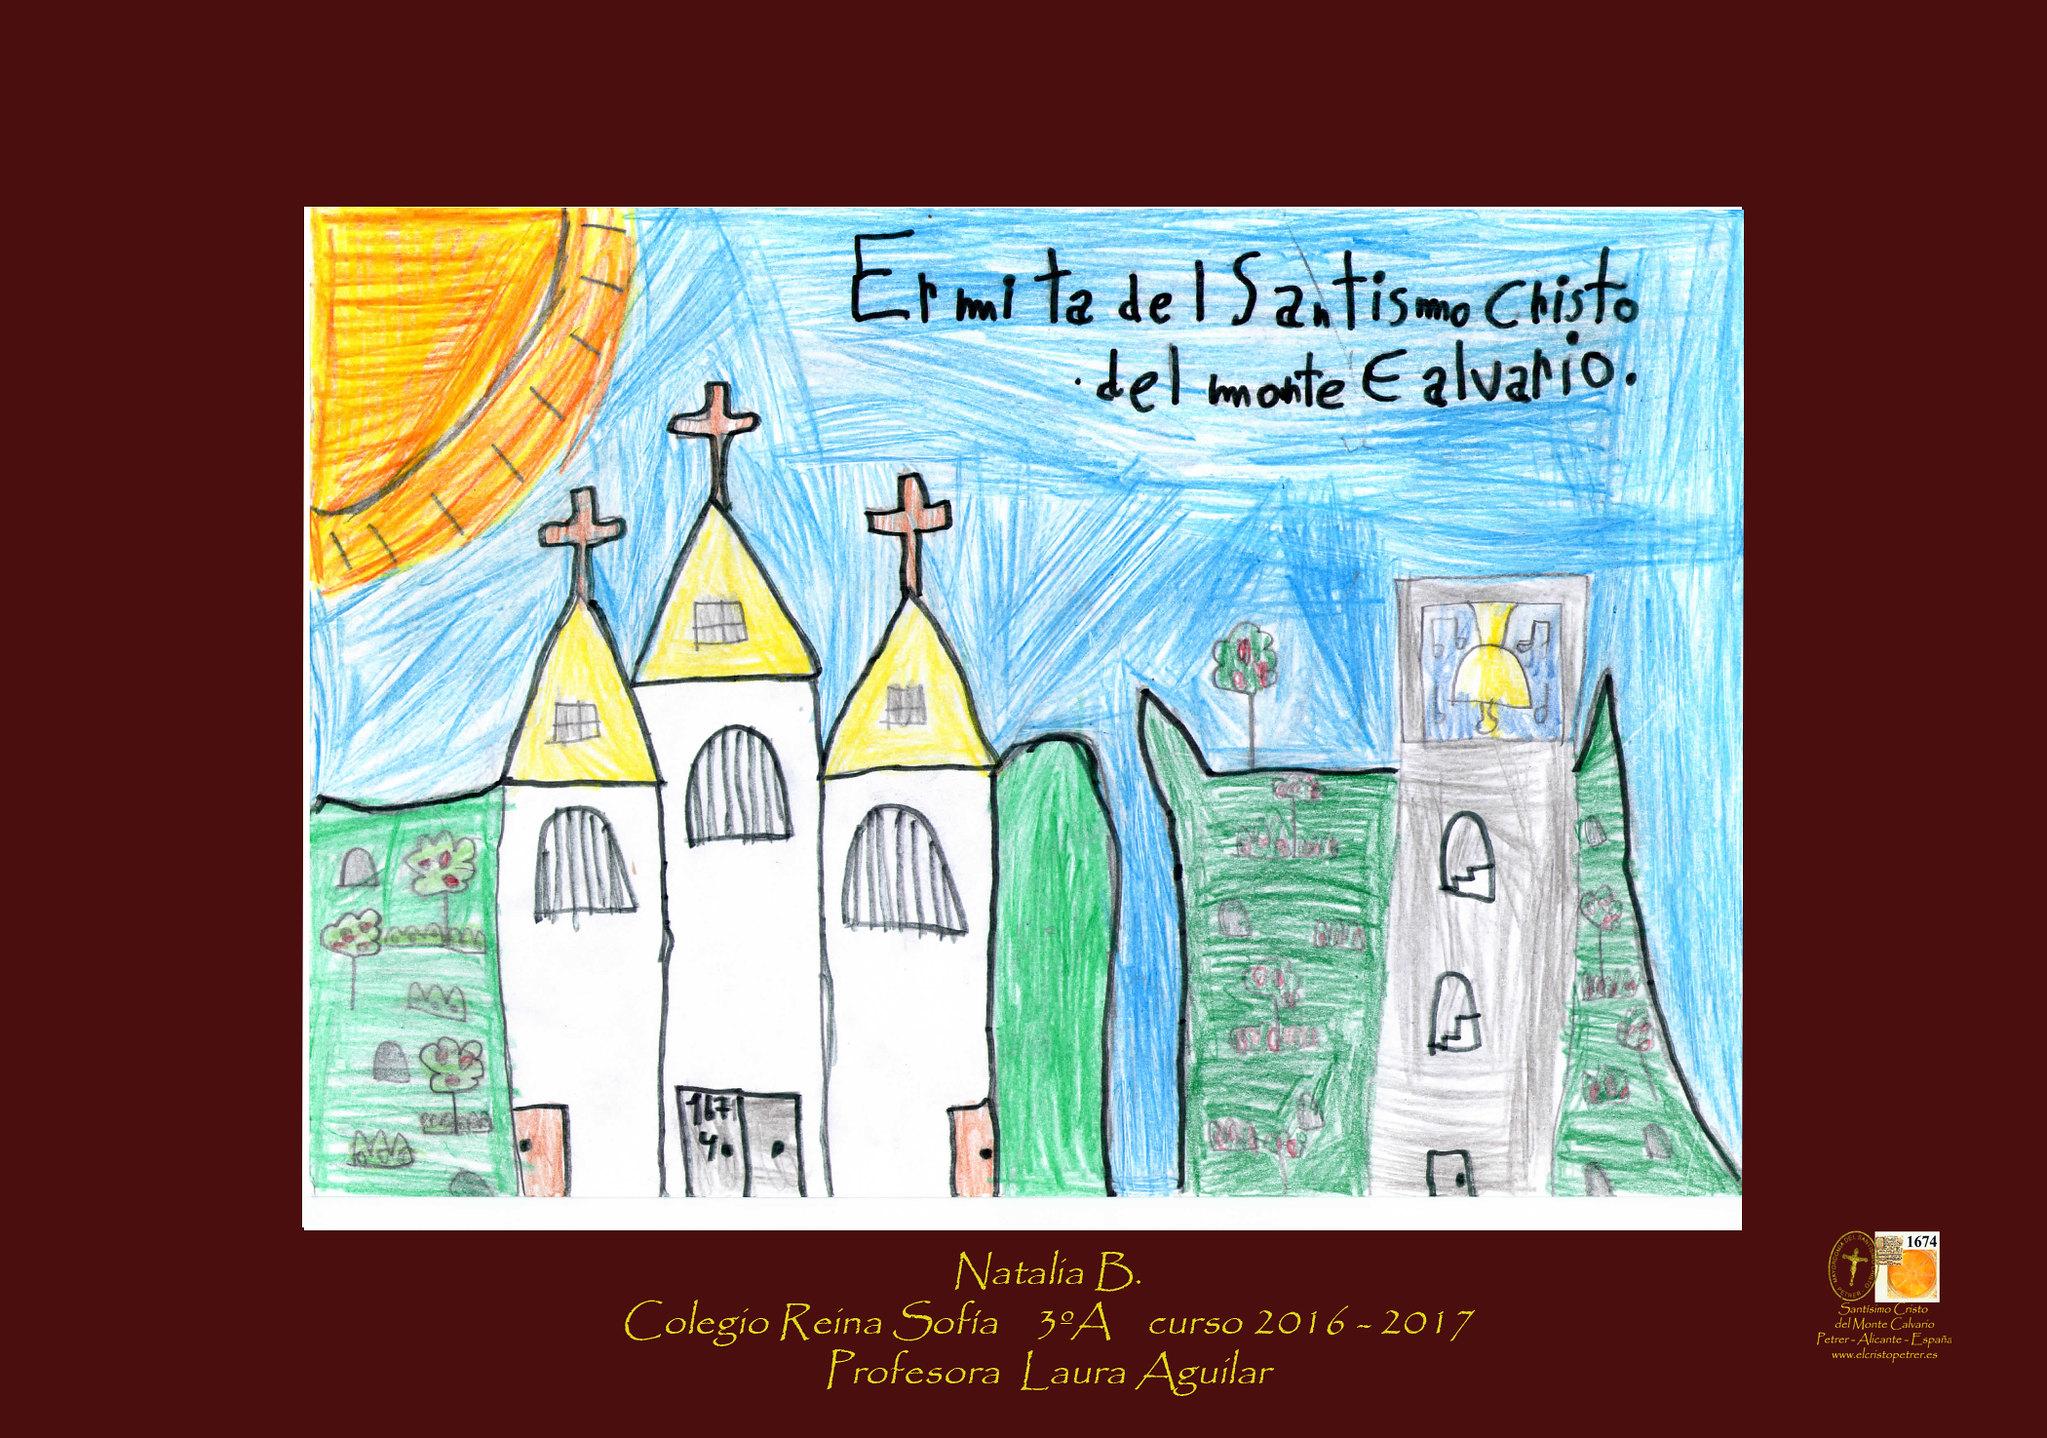 ElCristo - Actos - Exposicion Fotografica - (2017-12-01) - Reina sofía - 3ºA - Natalia B.